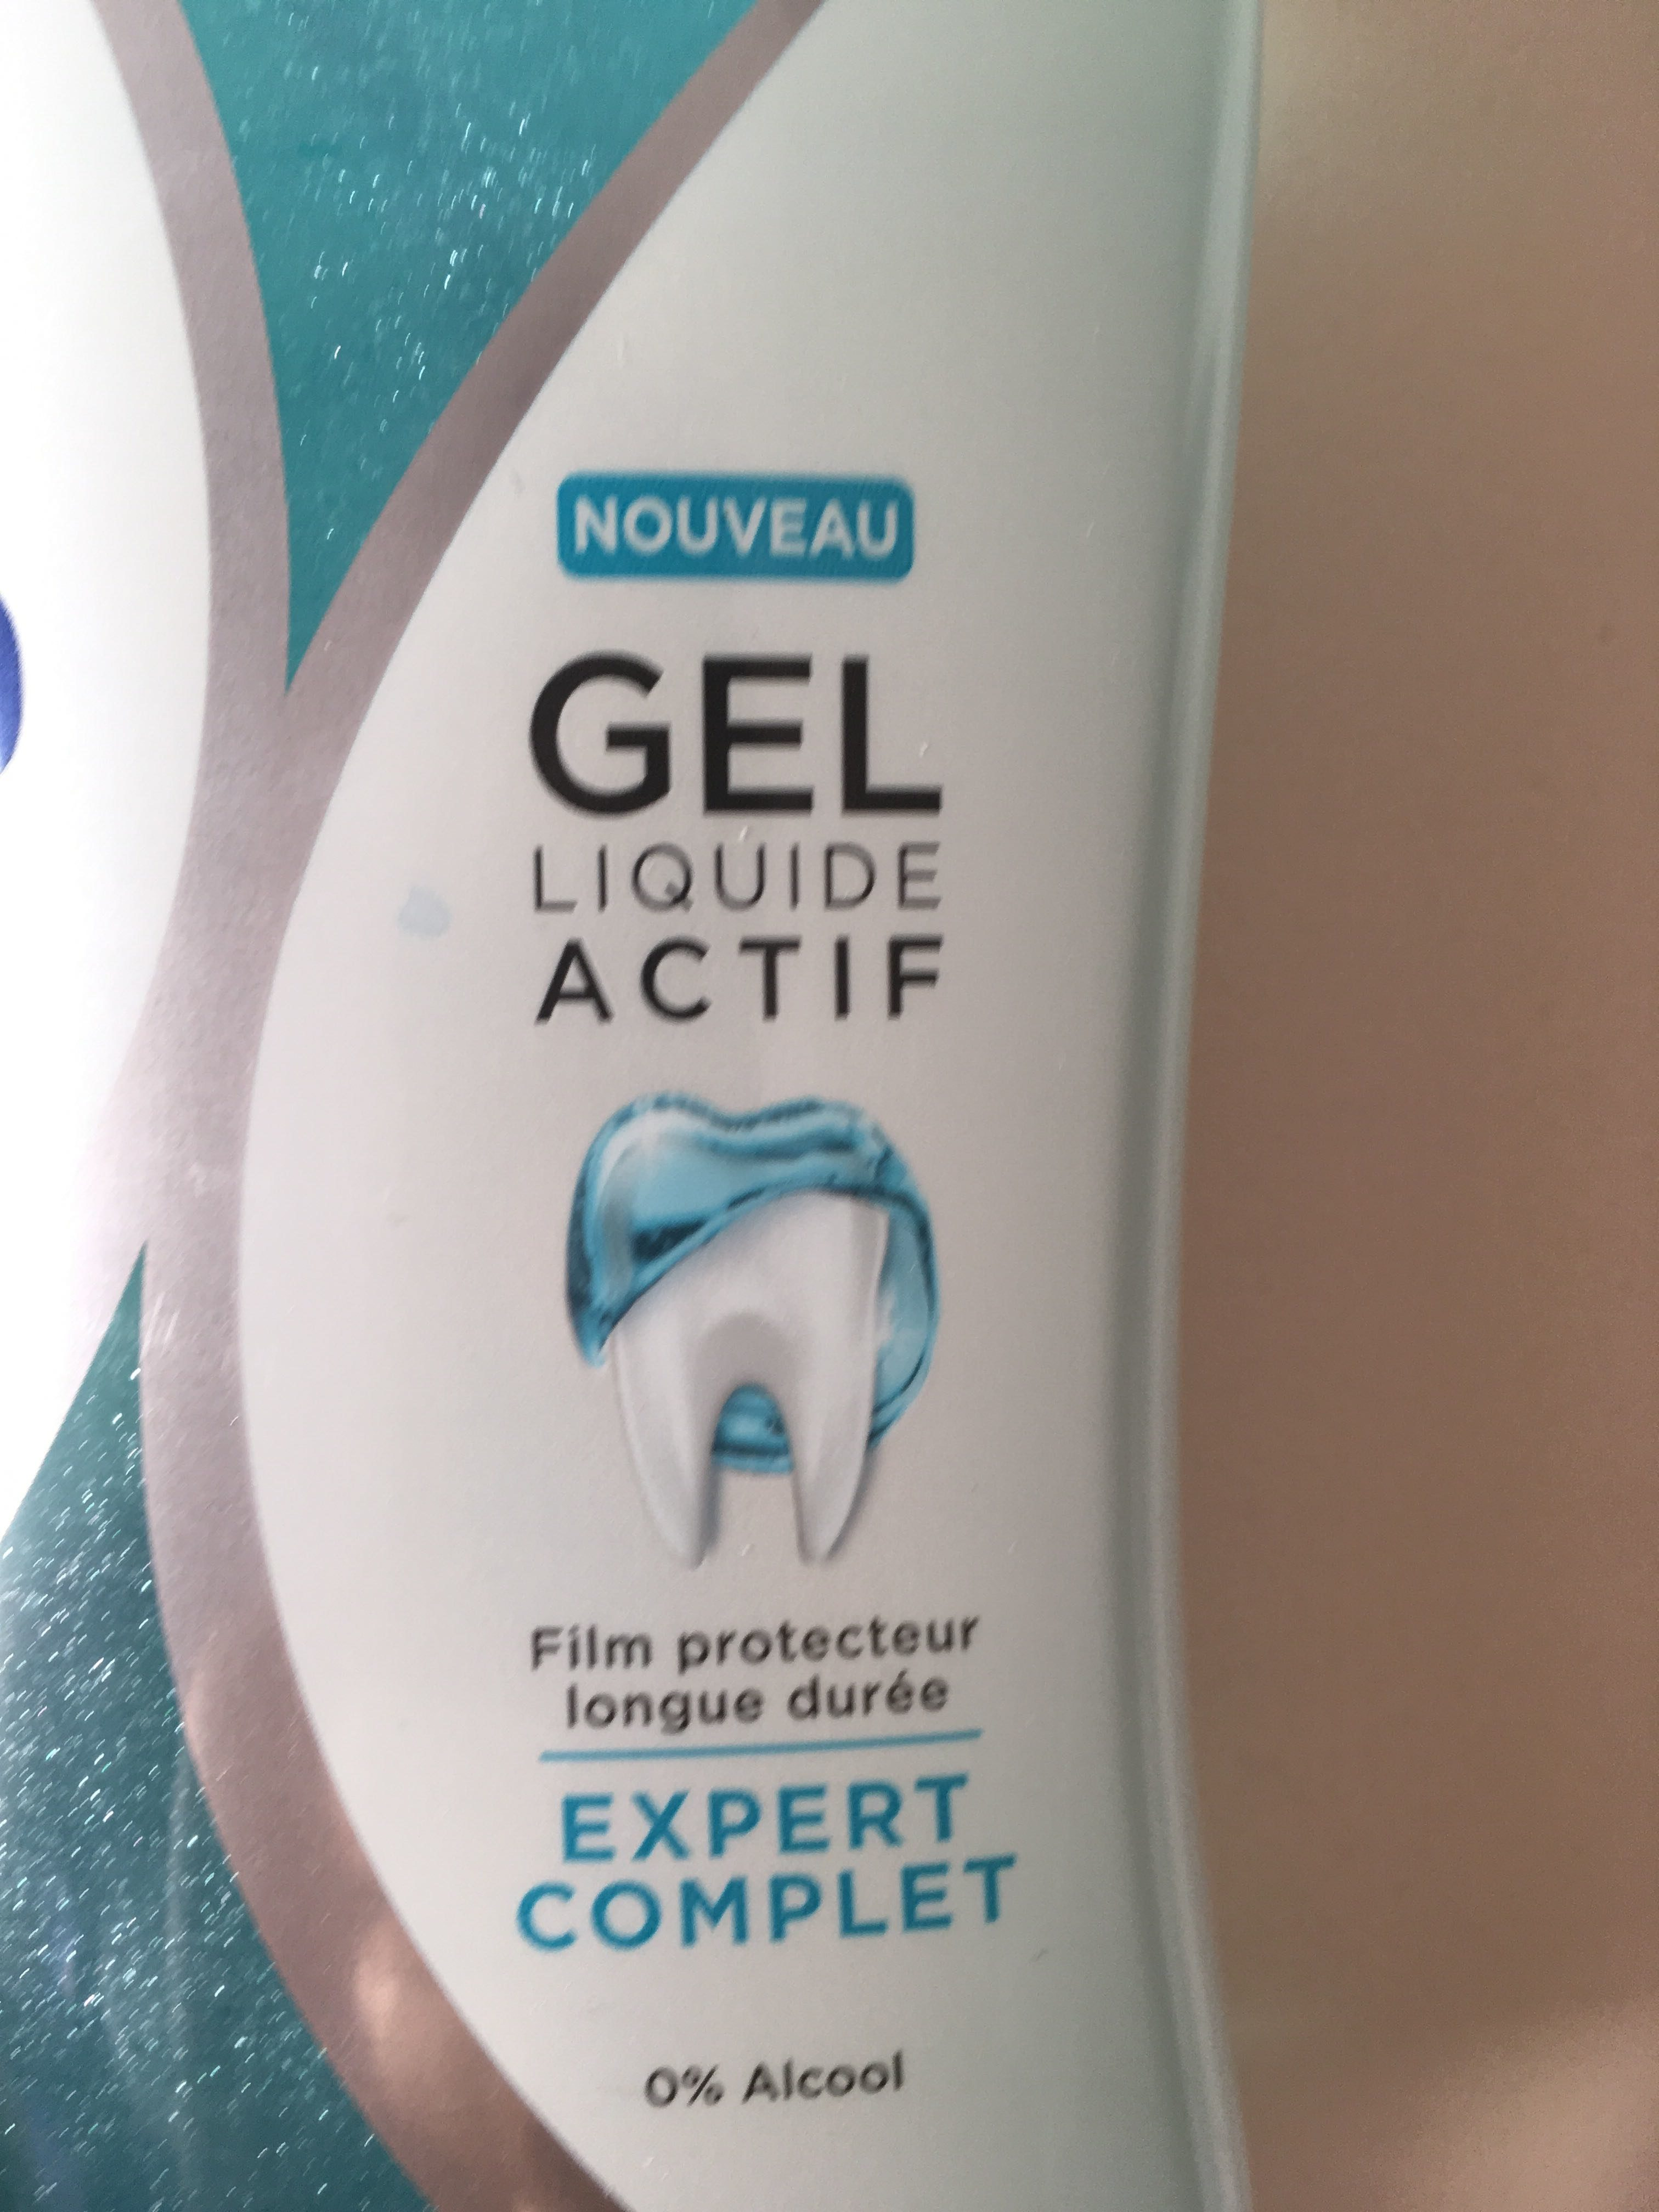 Signal Gel Liquide actif - Produit